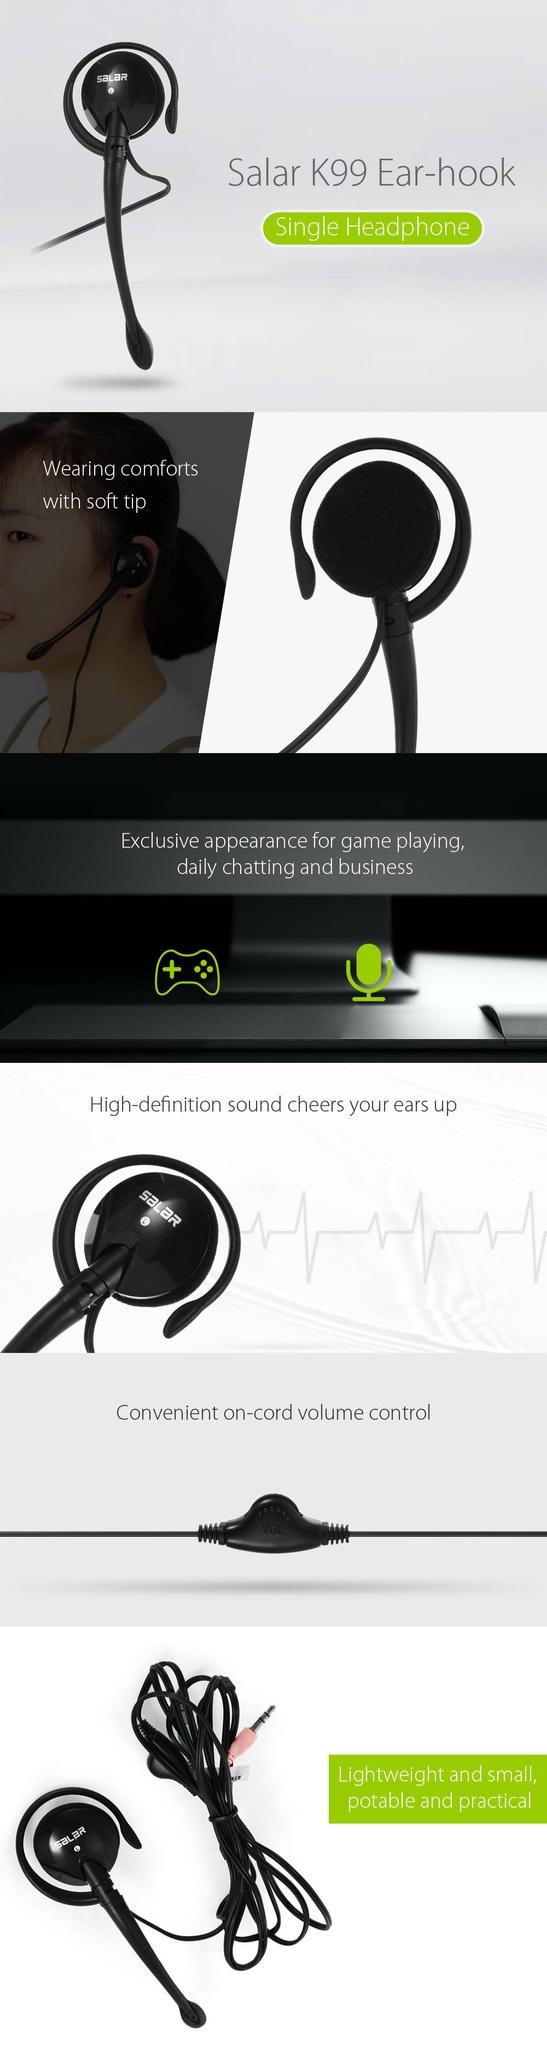 Salar K99 Ear-hook Headset for Business